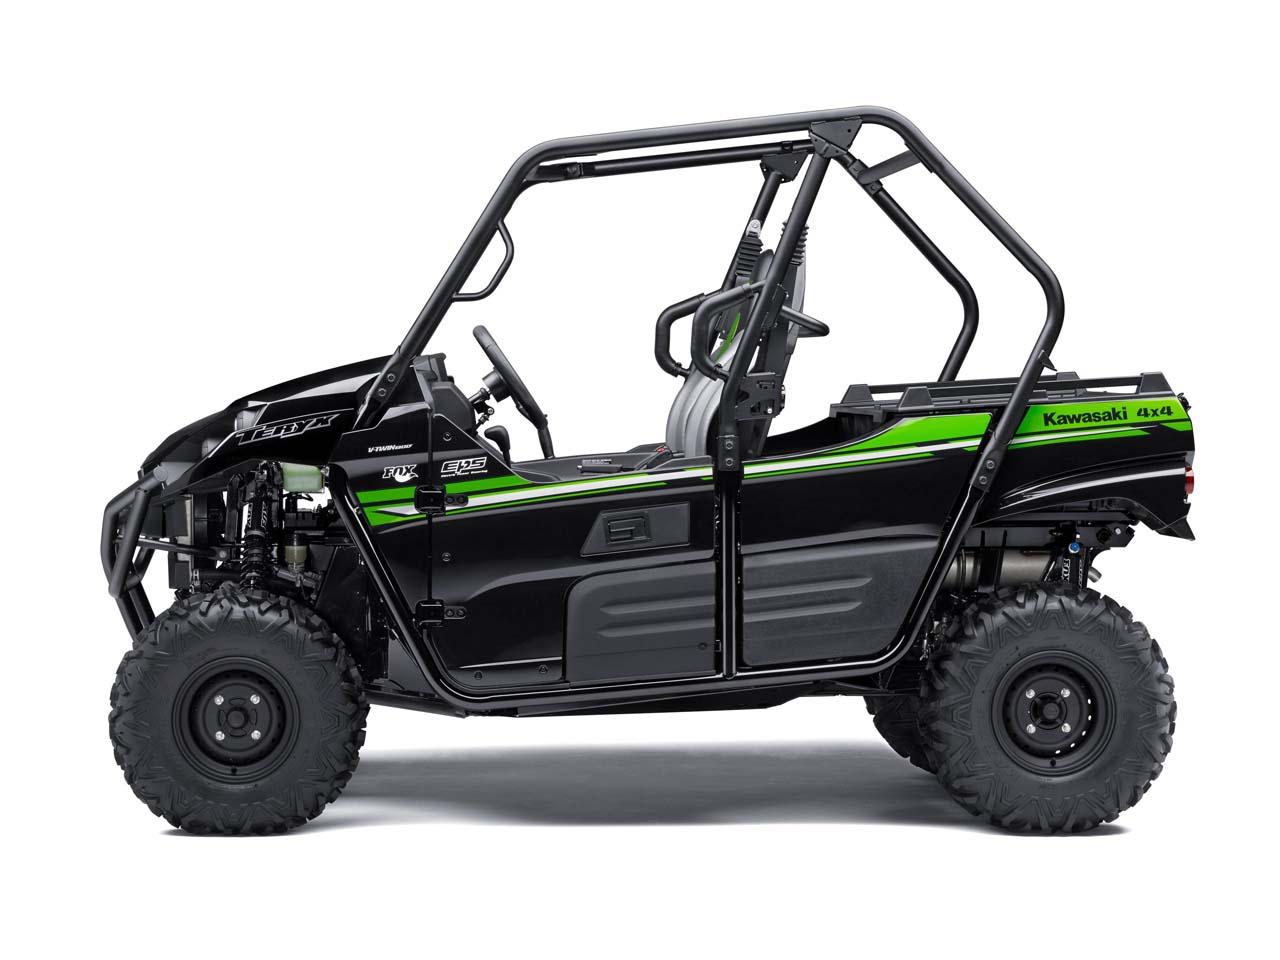 2018 Kawasaki Teryx And Teryx4 Atv